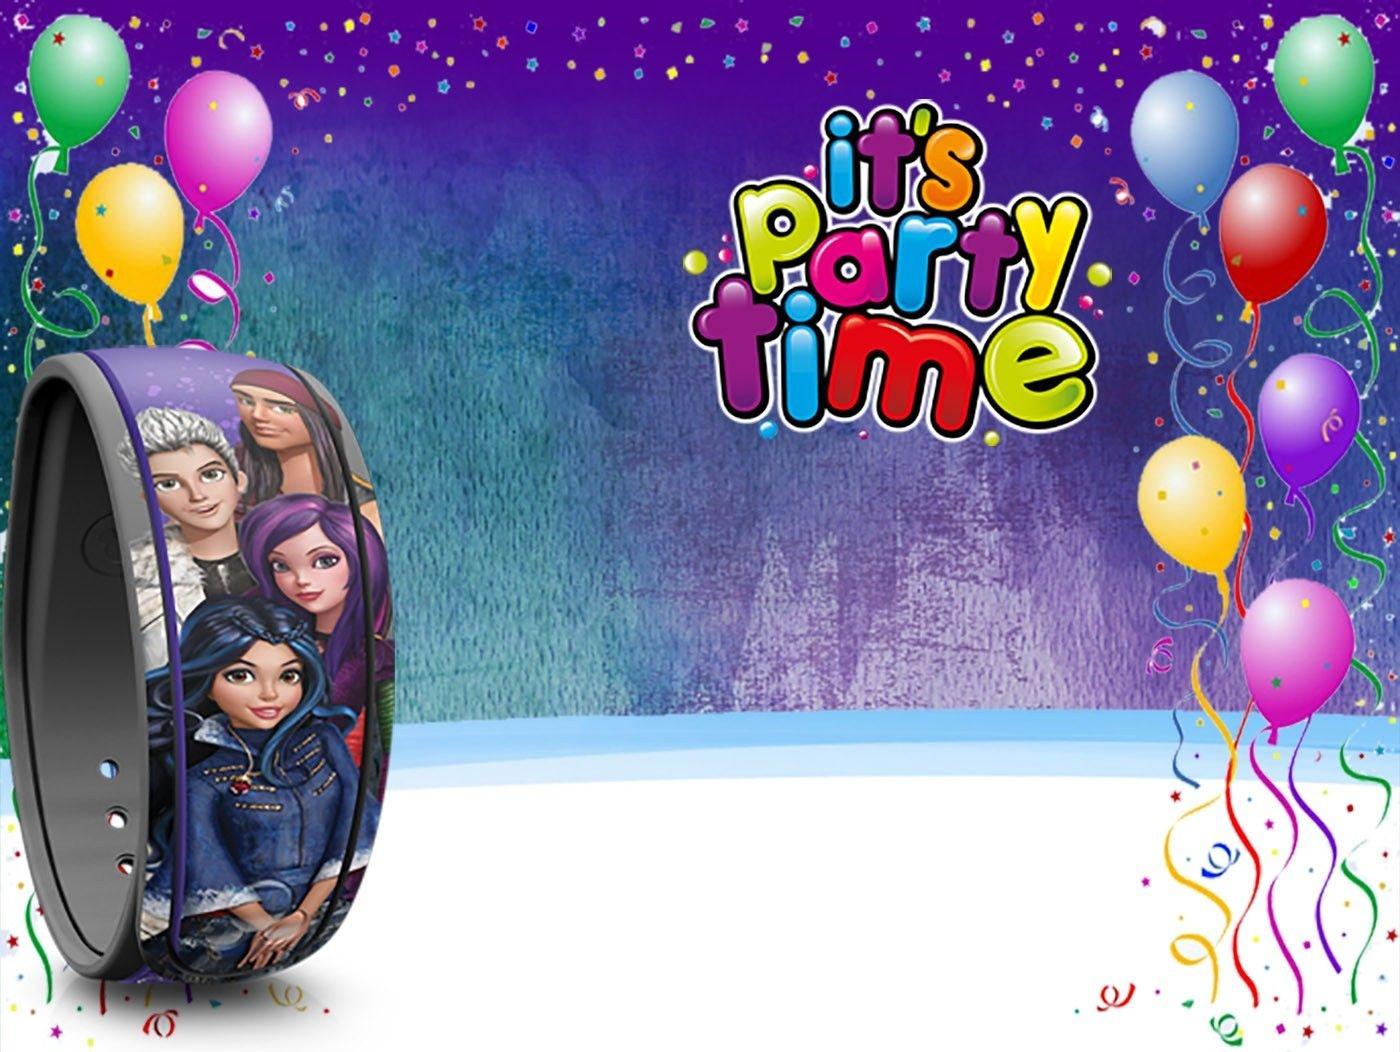 Free Printable Descendants Party Invitation Template | Coolest - Free Printable Descendants Invitations